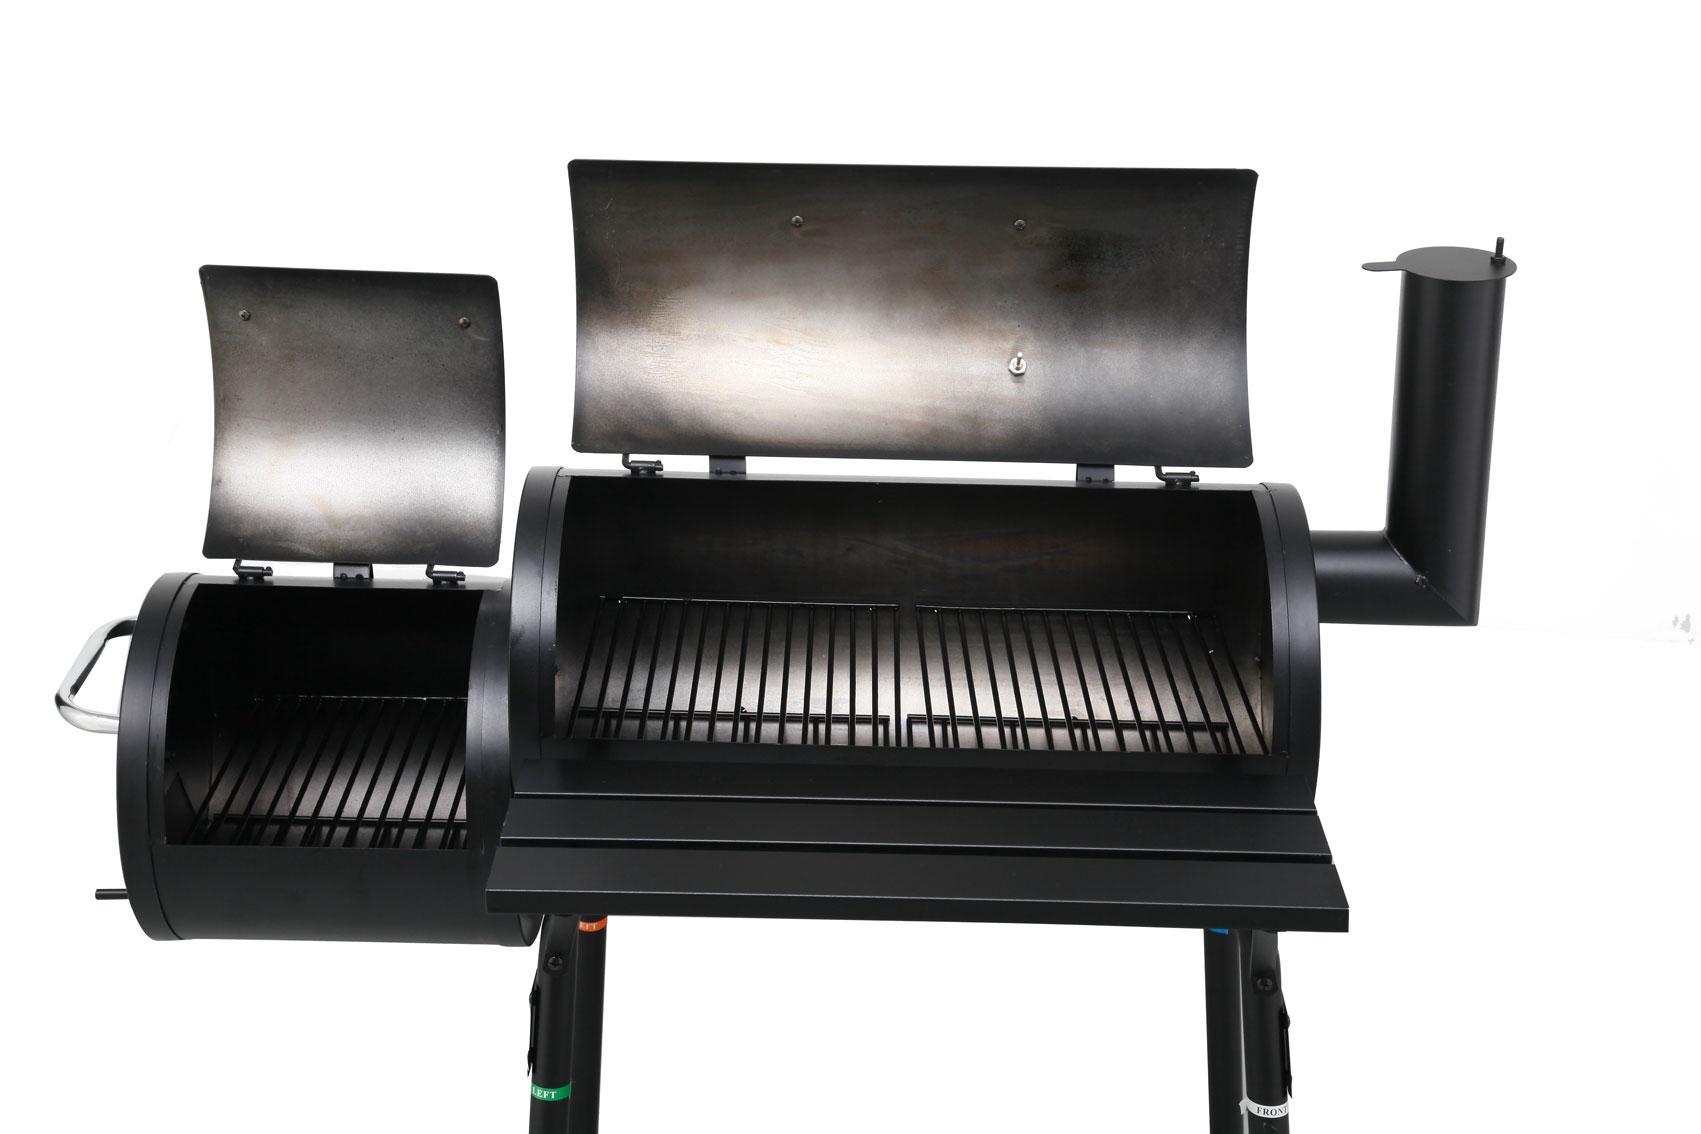 bbq smoker holzkohlegrill tepro wichita grillfl che 60 x 26 5 cm bei. Black Bedroom Furniture Sets. Home Design Ideas